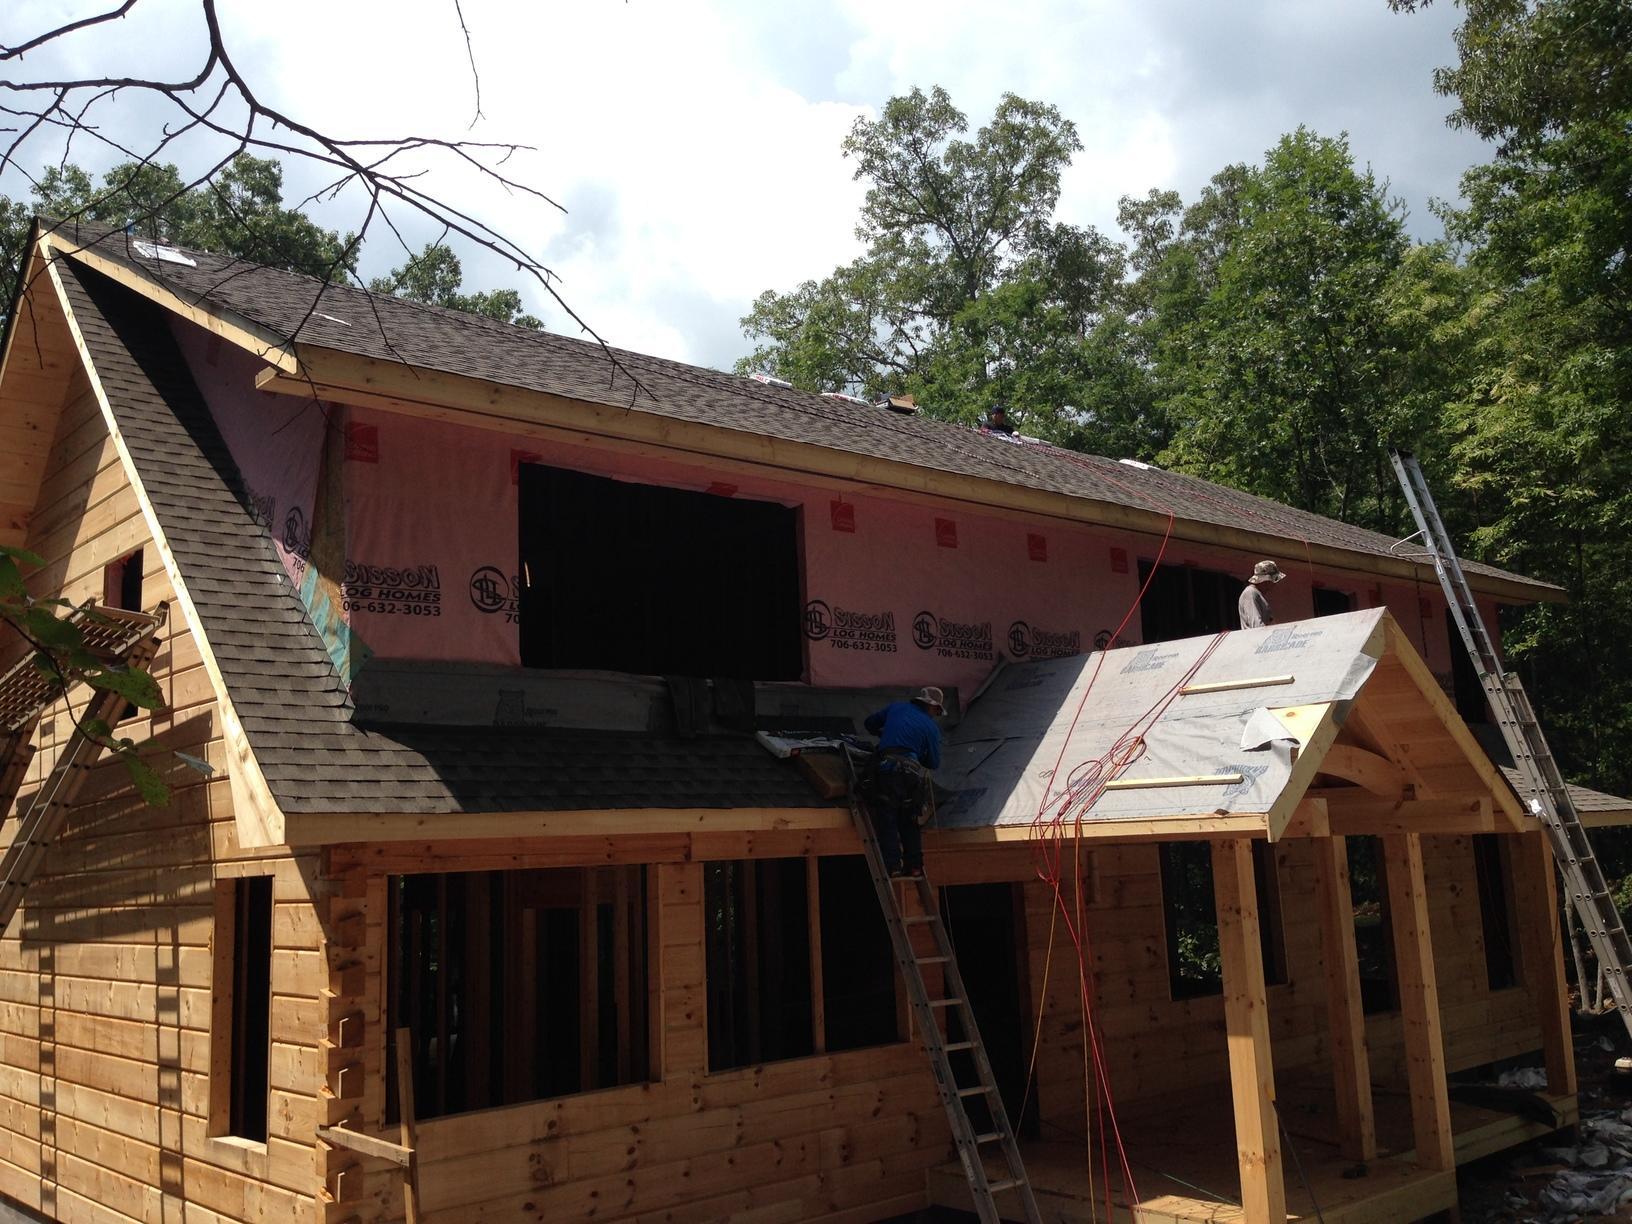 New Construction home in blue ridge, ga - Before Photo